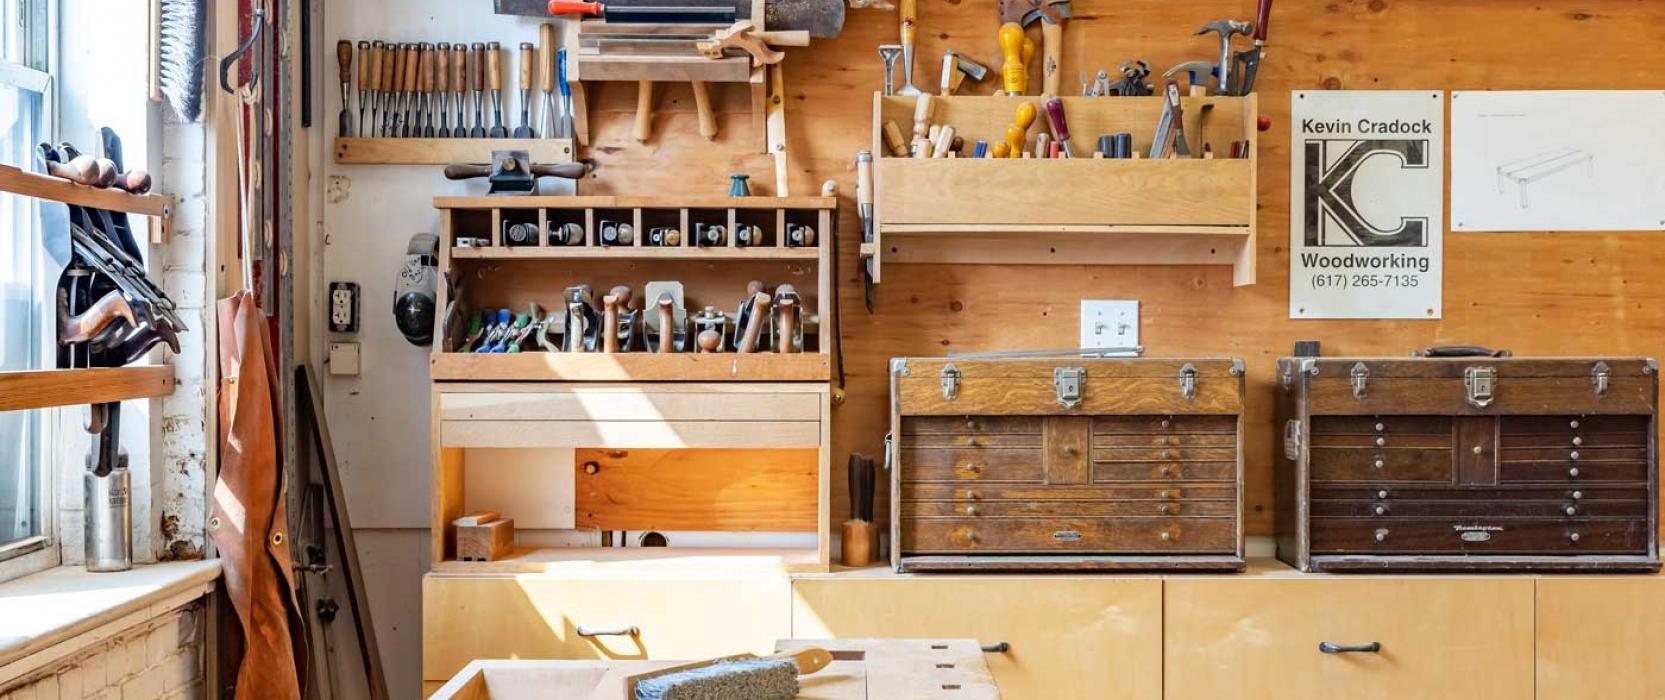 Kevin Cradock woodworking shop